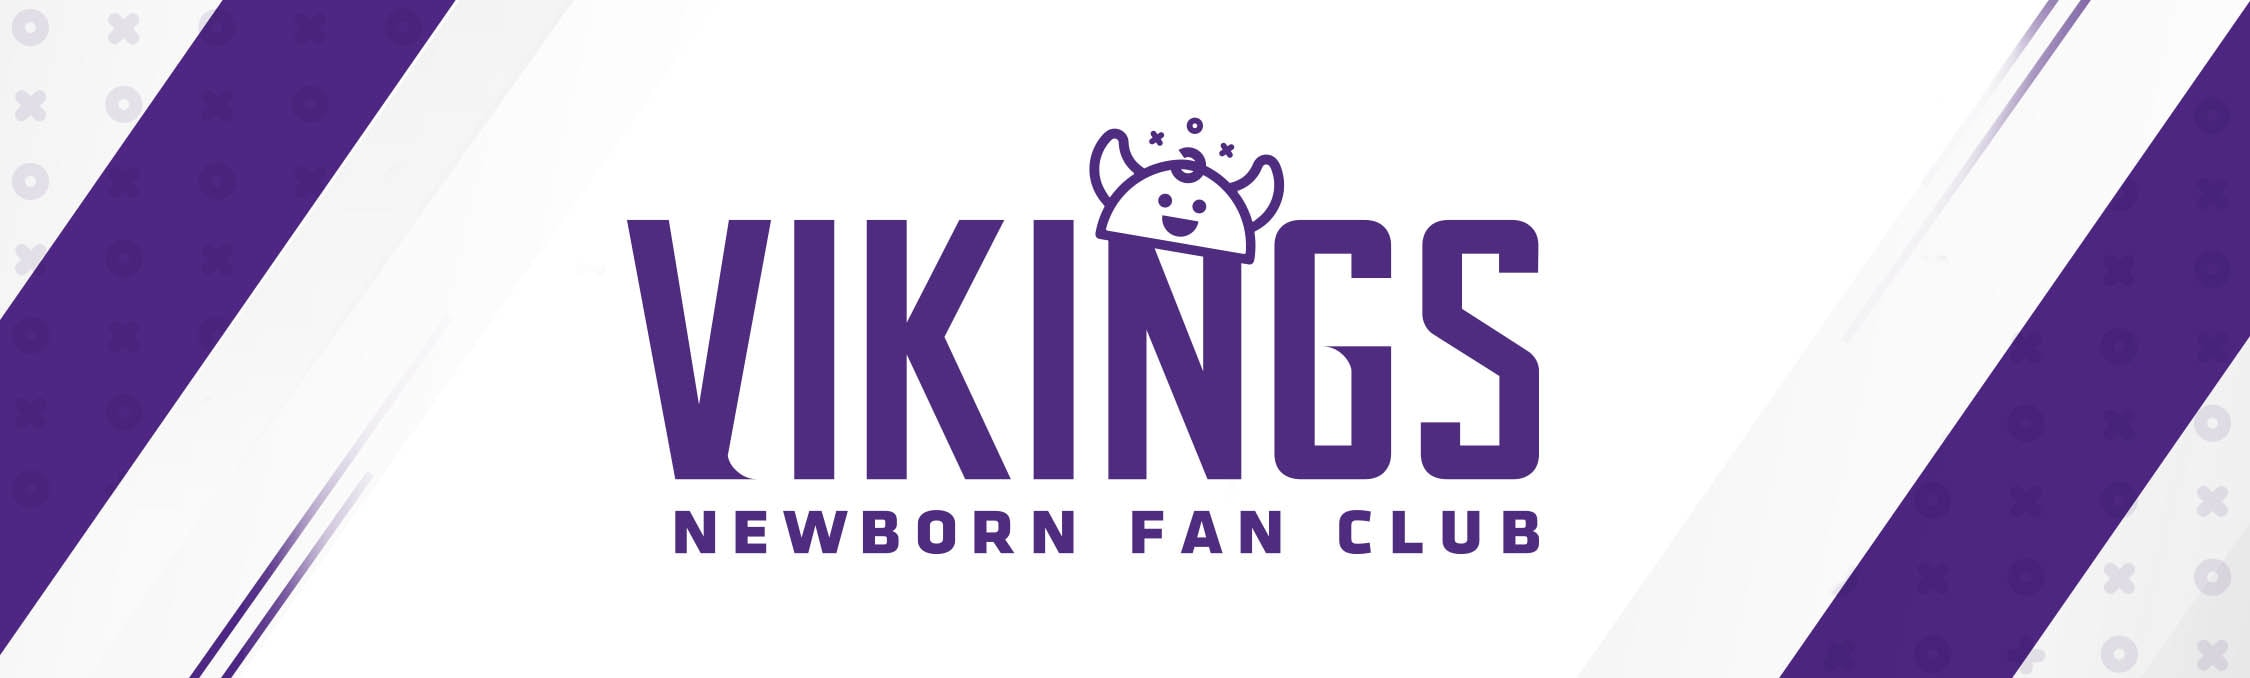 385fc51e5105eb Welcome to the Vikings Newborn Fan Club! The Minnesota Vikings want to  congratulate you on your new baby and welcome you to the Vikings family!